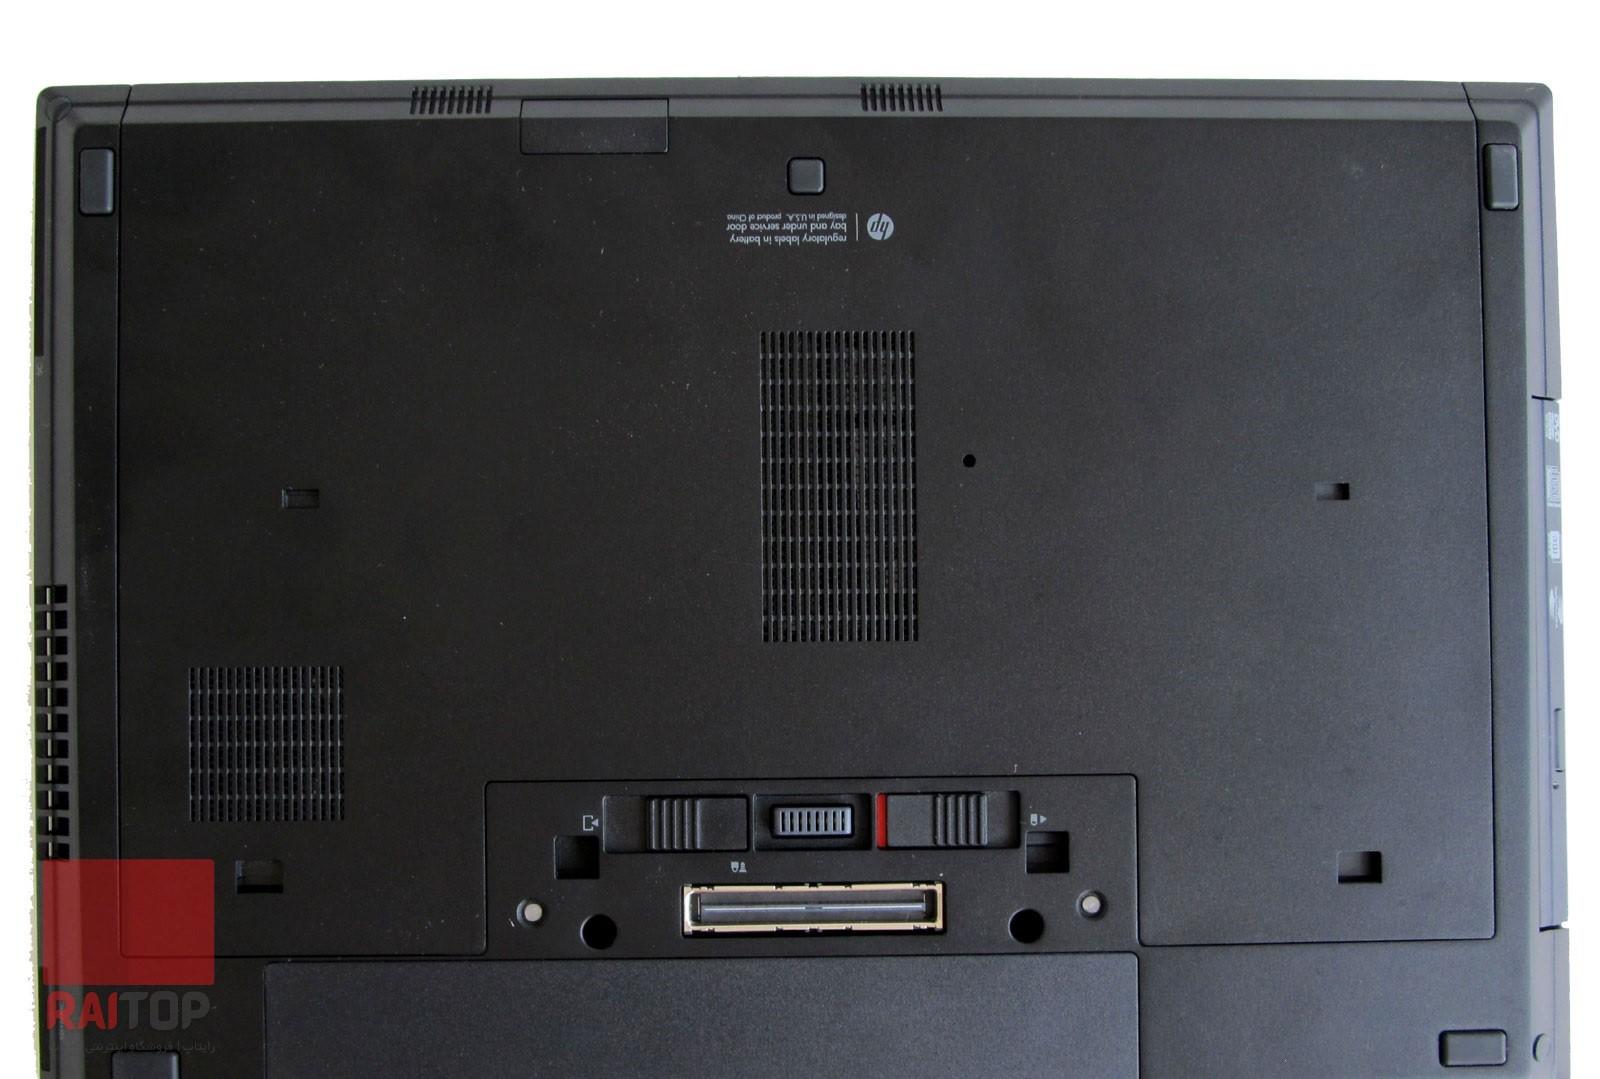 لپتاپ استوک HP مدل EliteBook 8560p i7 قاب زیرین